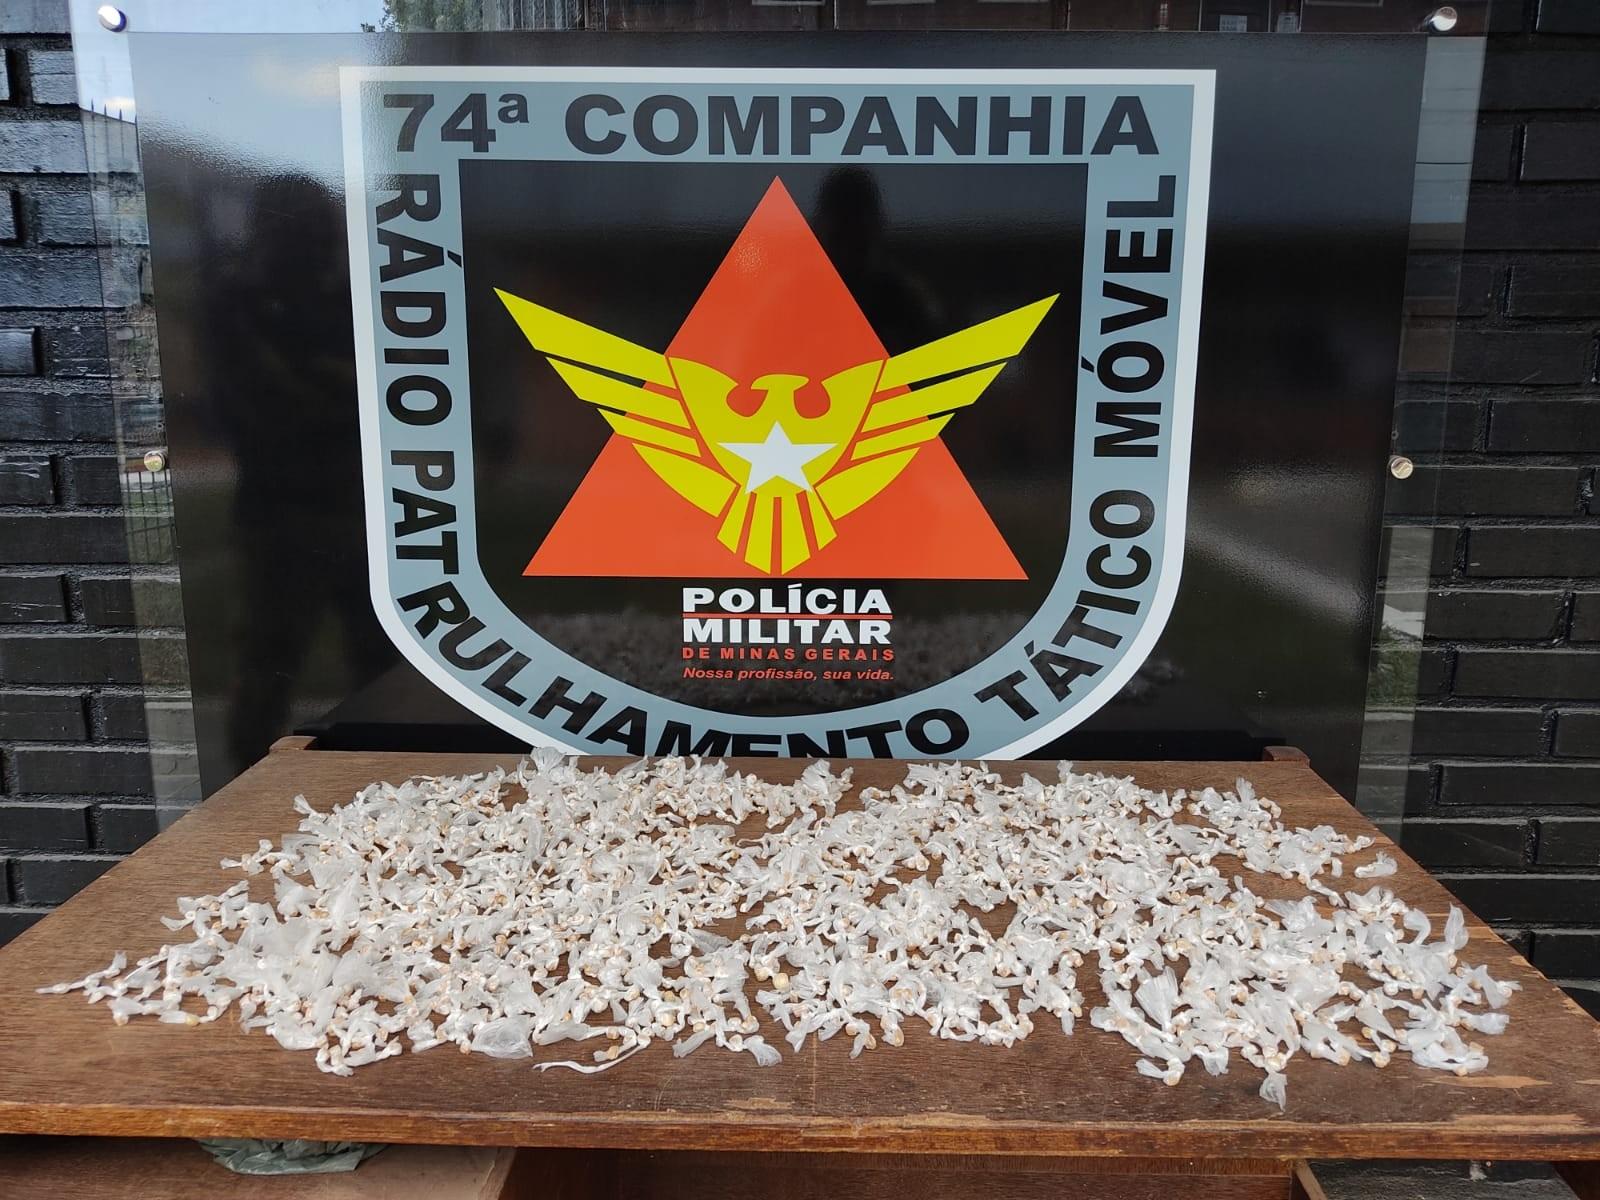 Polícia Militar apreende 2.250 pedras de crack em Teófilo Otoni